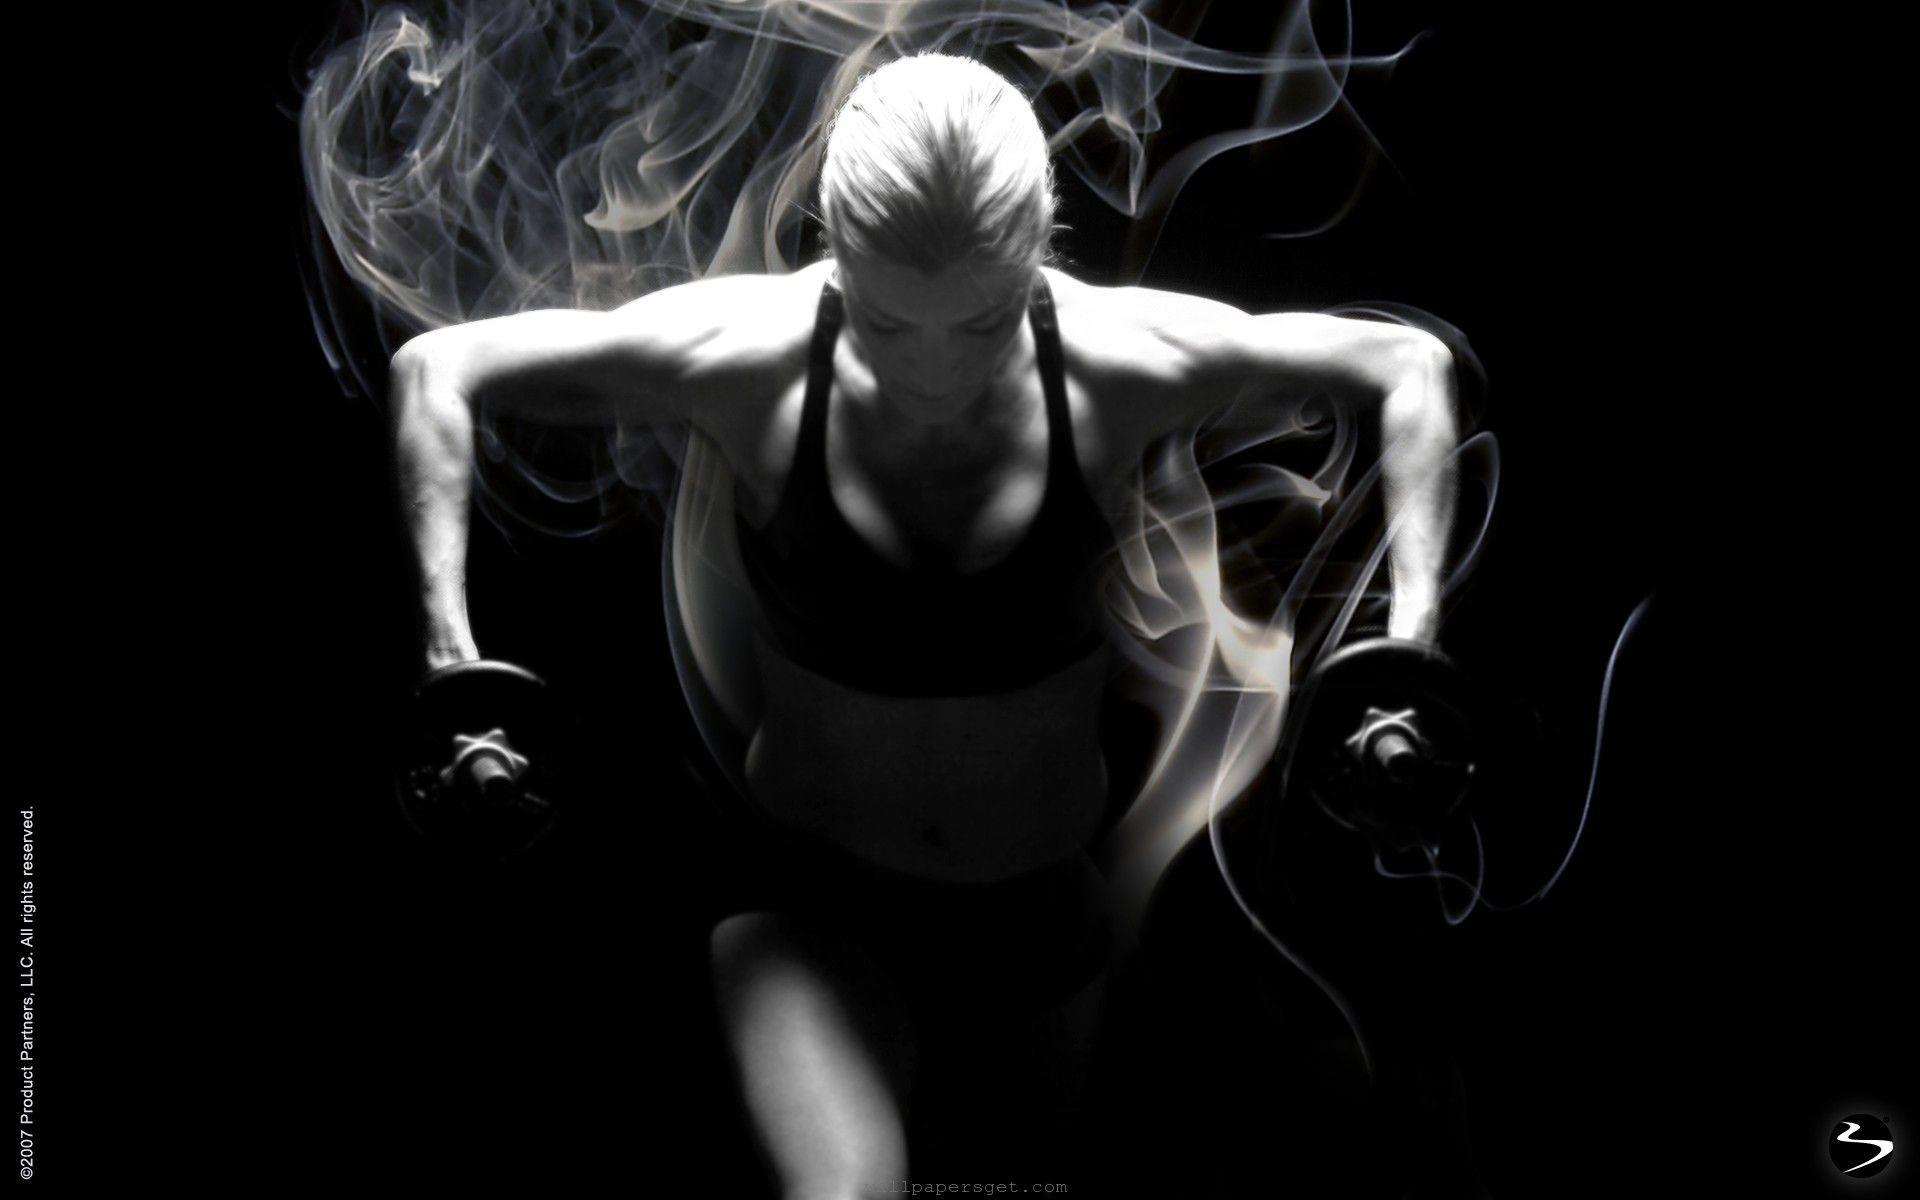 Fitness desktop wallpaper 58 images - Wallpaper fitness women ...